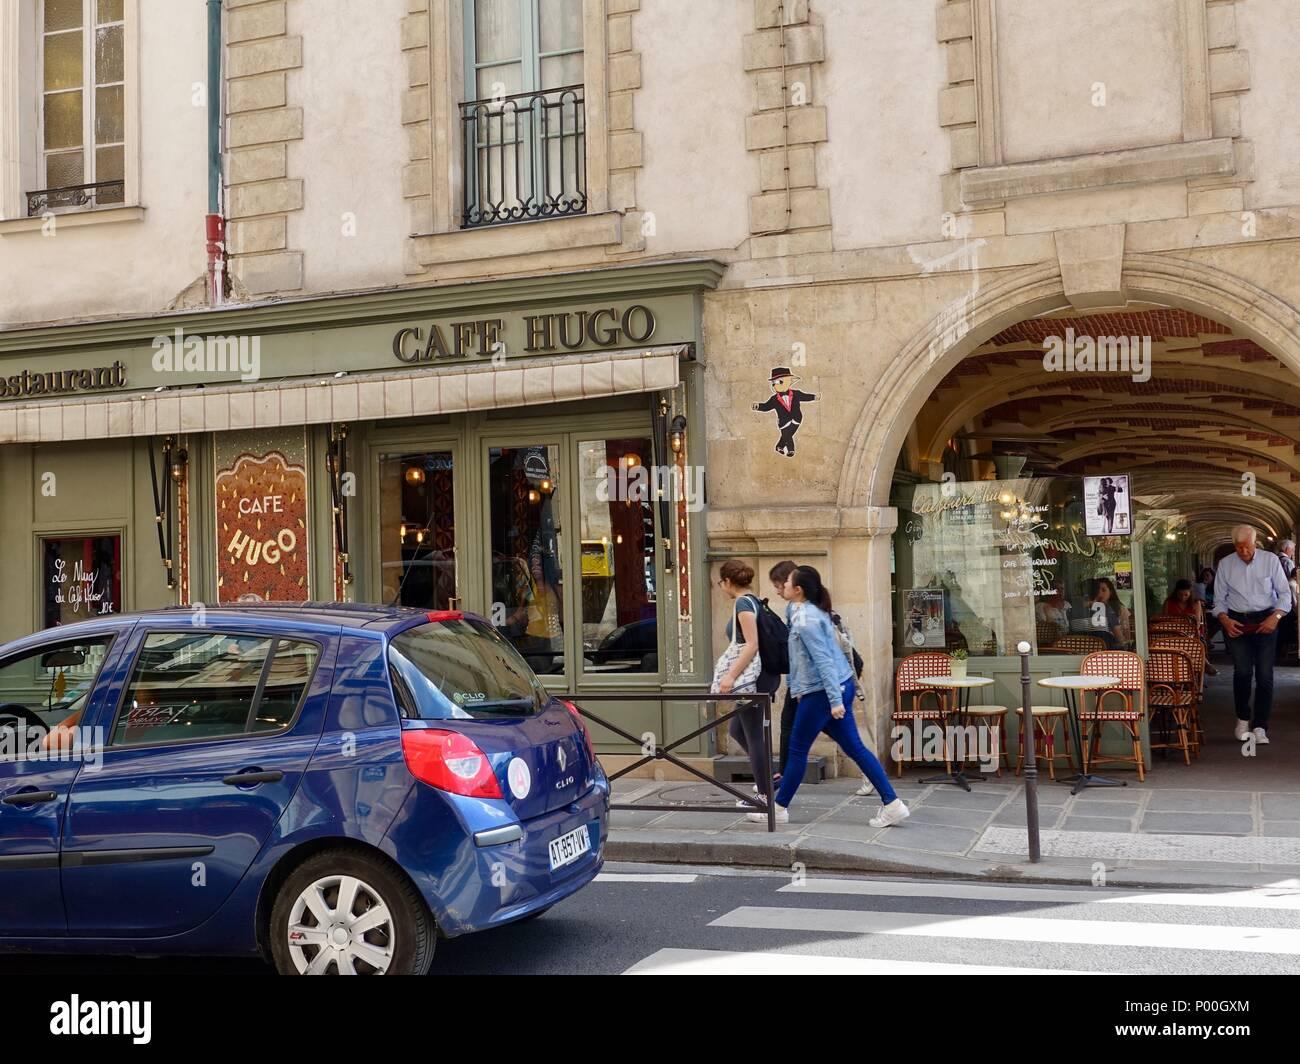 Pedestrians outside Cafe Hugo and the arcaded buildings of Place des Vosges, Paris, France - Stock Image